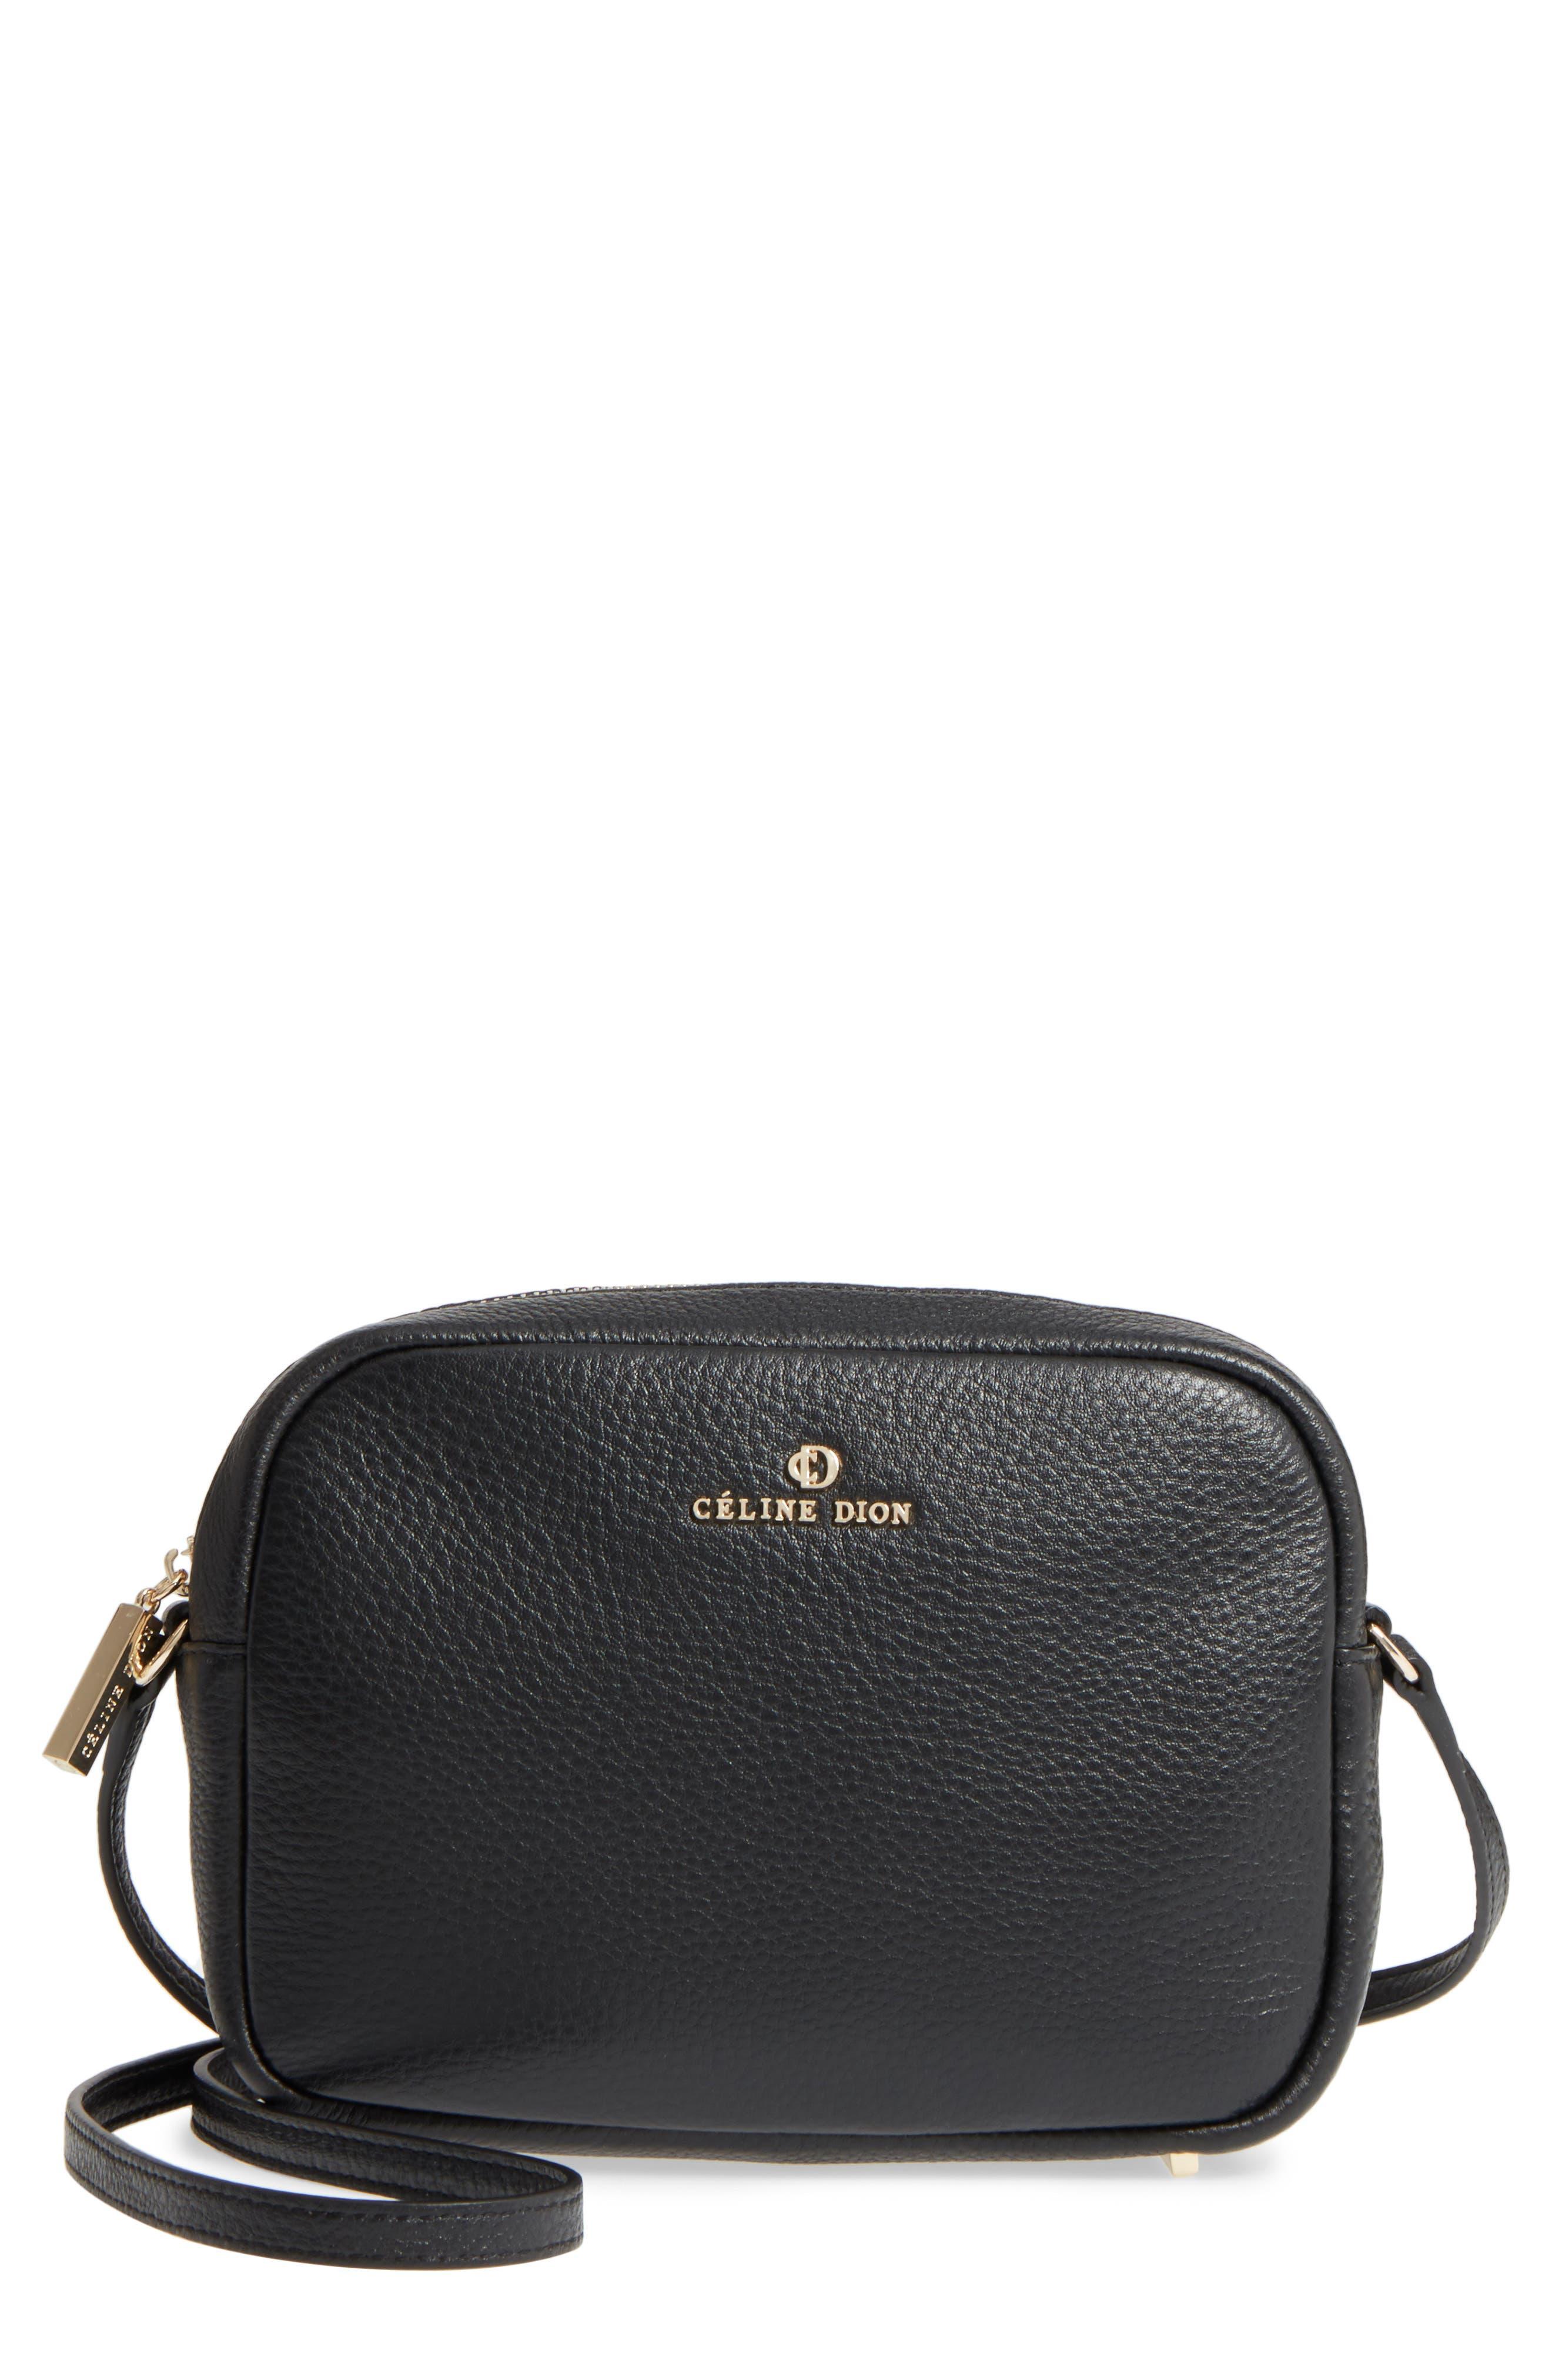 Céline Dion Adagio Leather Camera Crossbody Bag,                         Main,                         color, 001